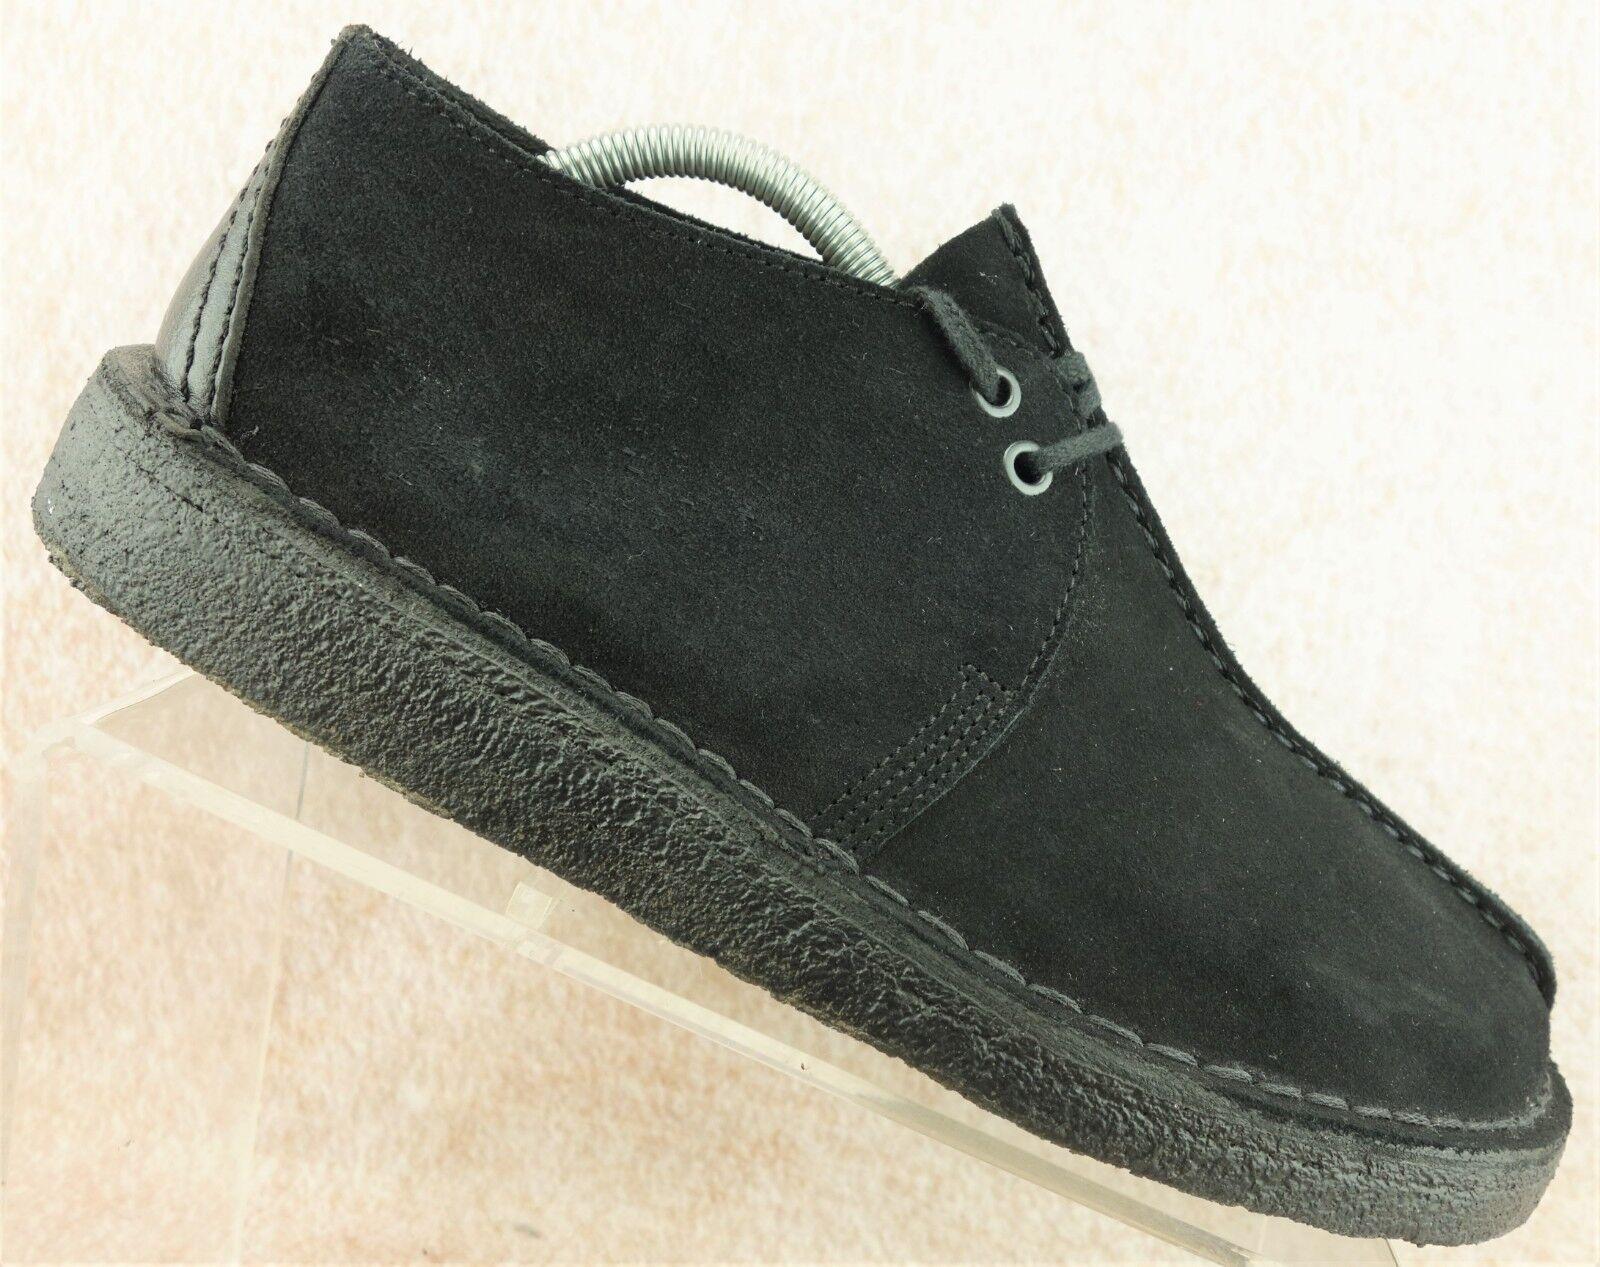 Clarks Originals Desert Trek Black Suede Casual Trail Oxford Shoes Men's 9.5 M